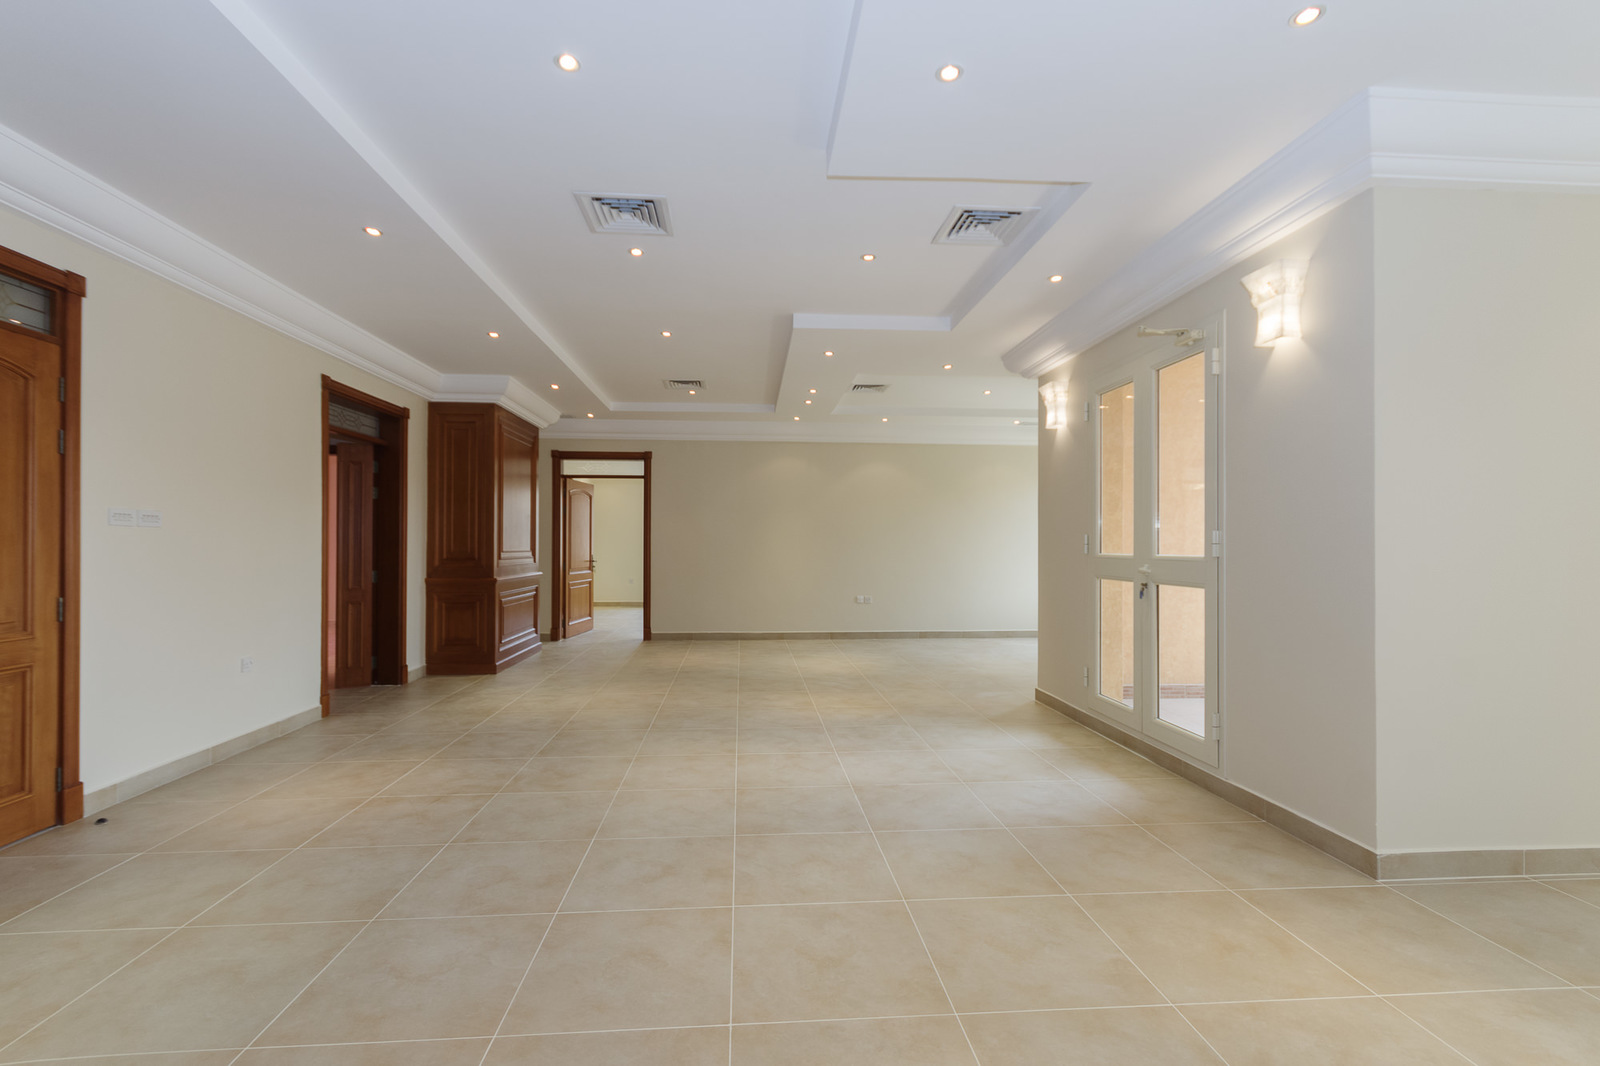 Abdulla Mubarak – great, large, unfurnished, four bedroom floor